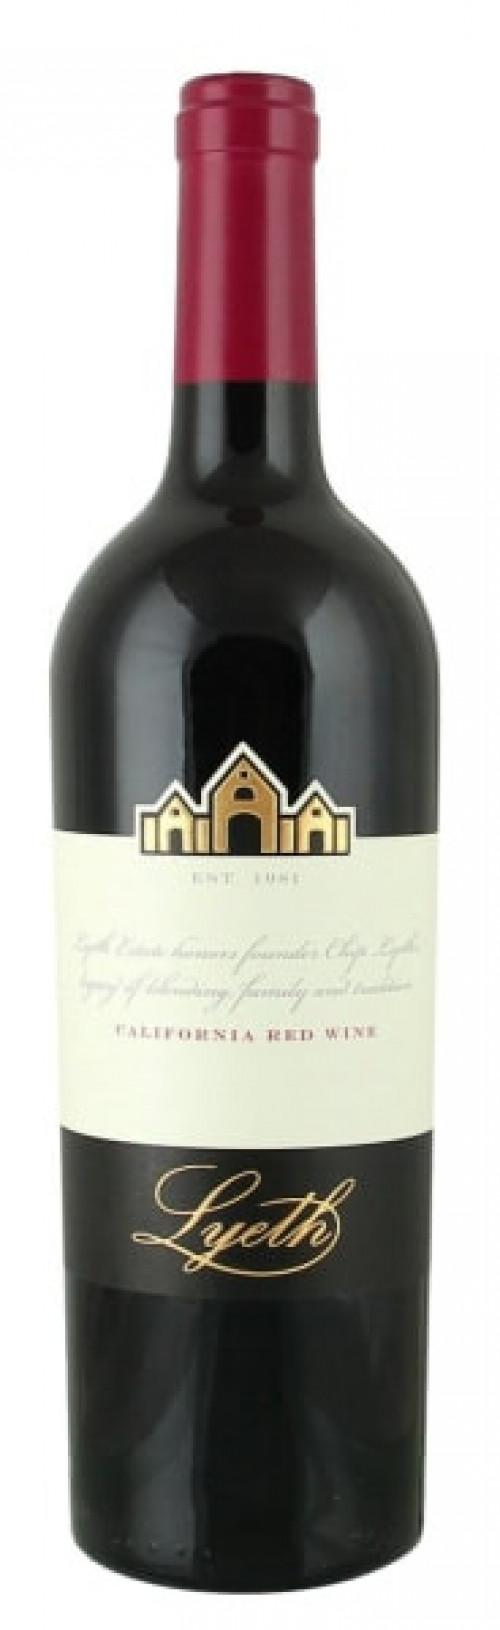 2018 Lyeth Red Wine 750ml